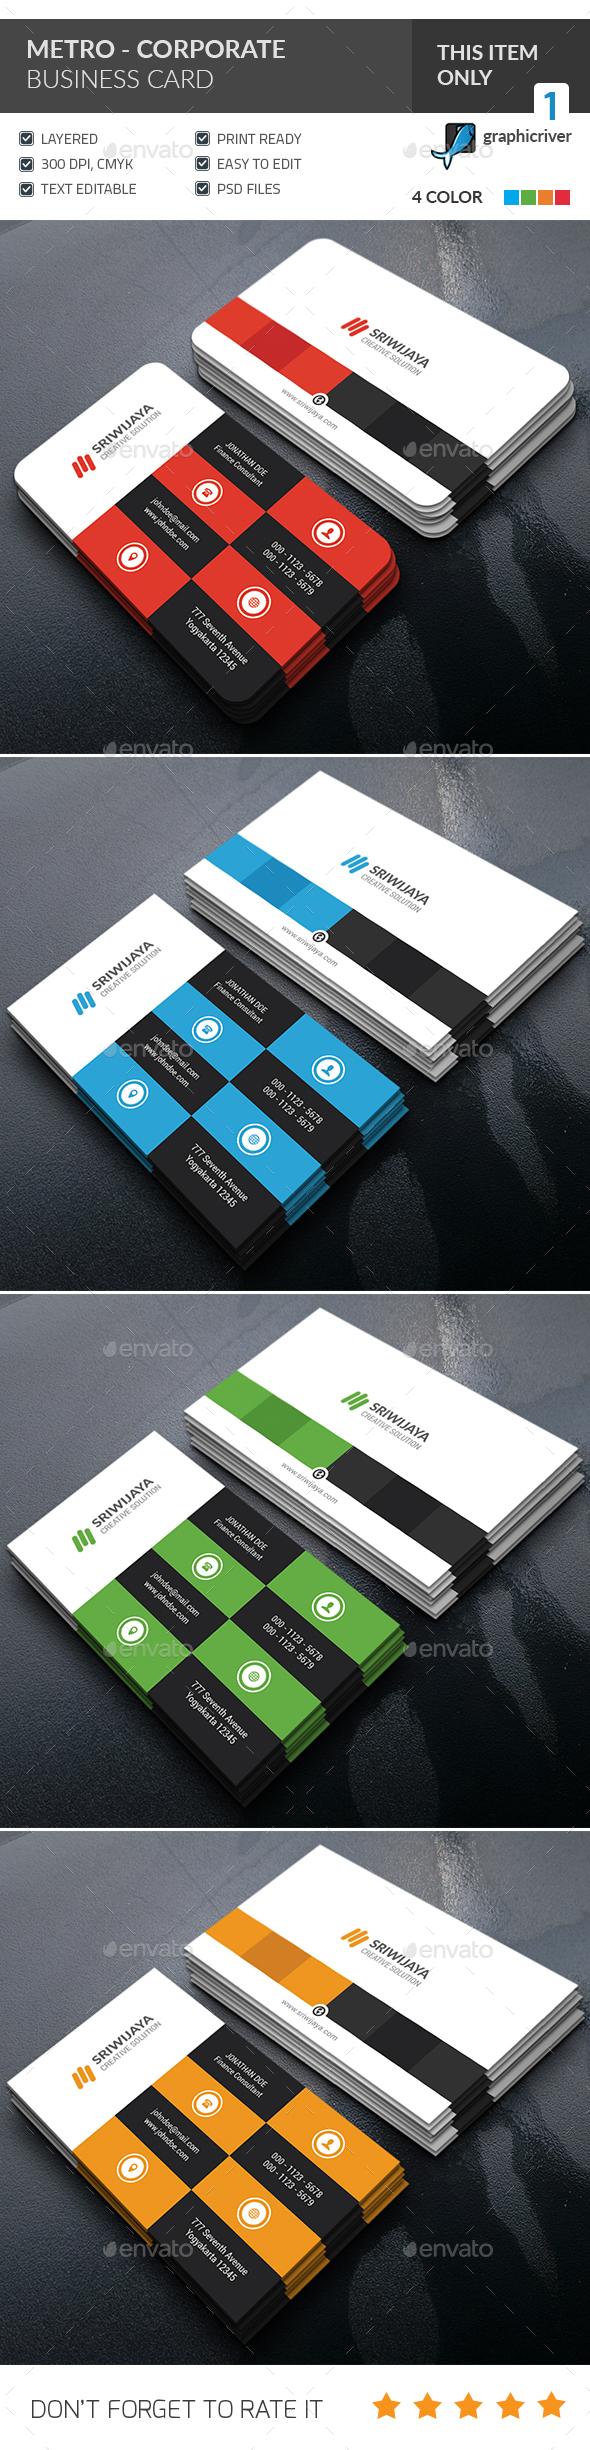 Metro Corporate Business Card - Corporate Business Cards